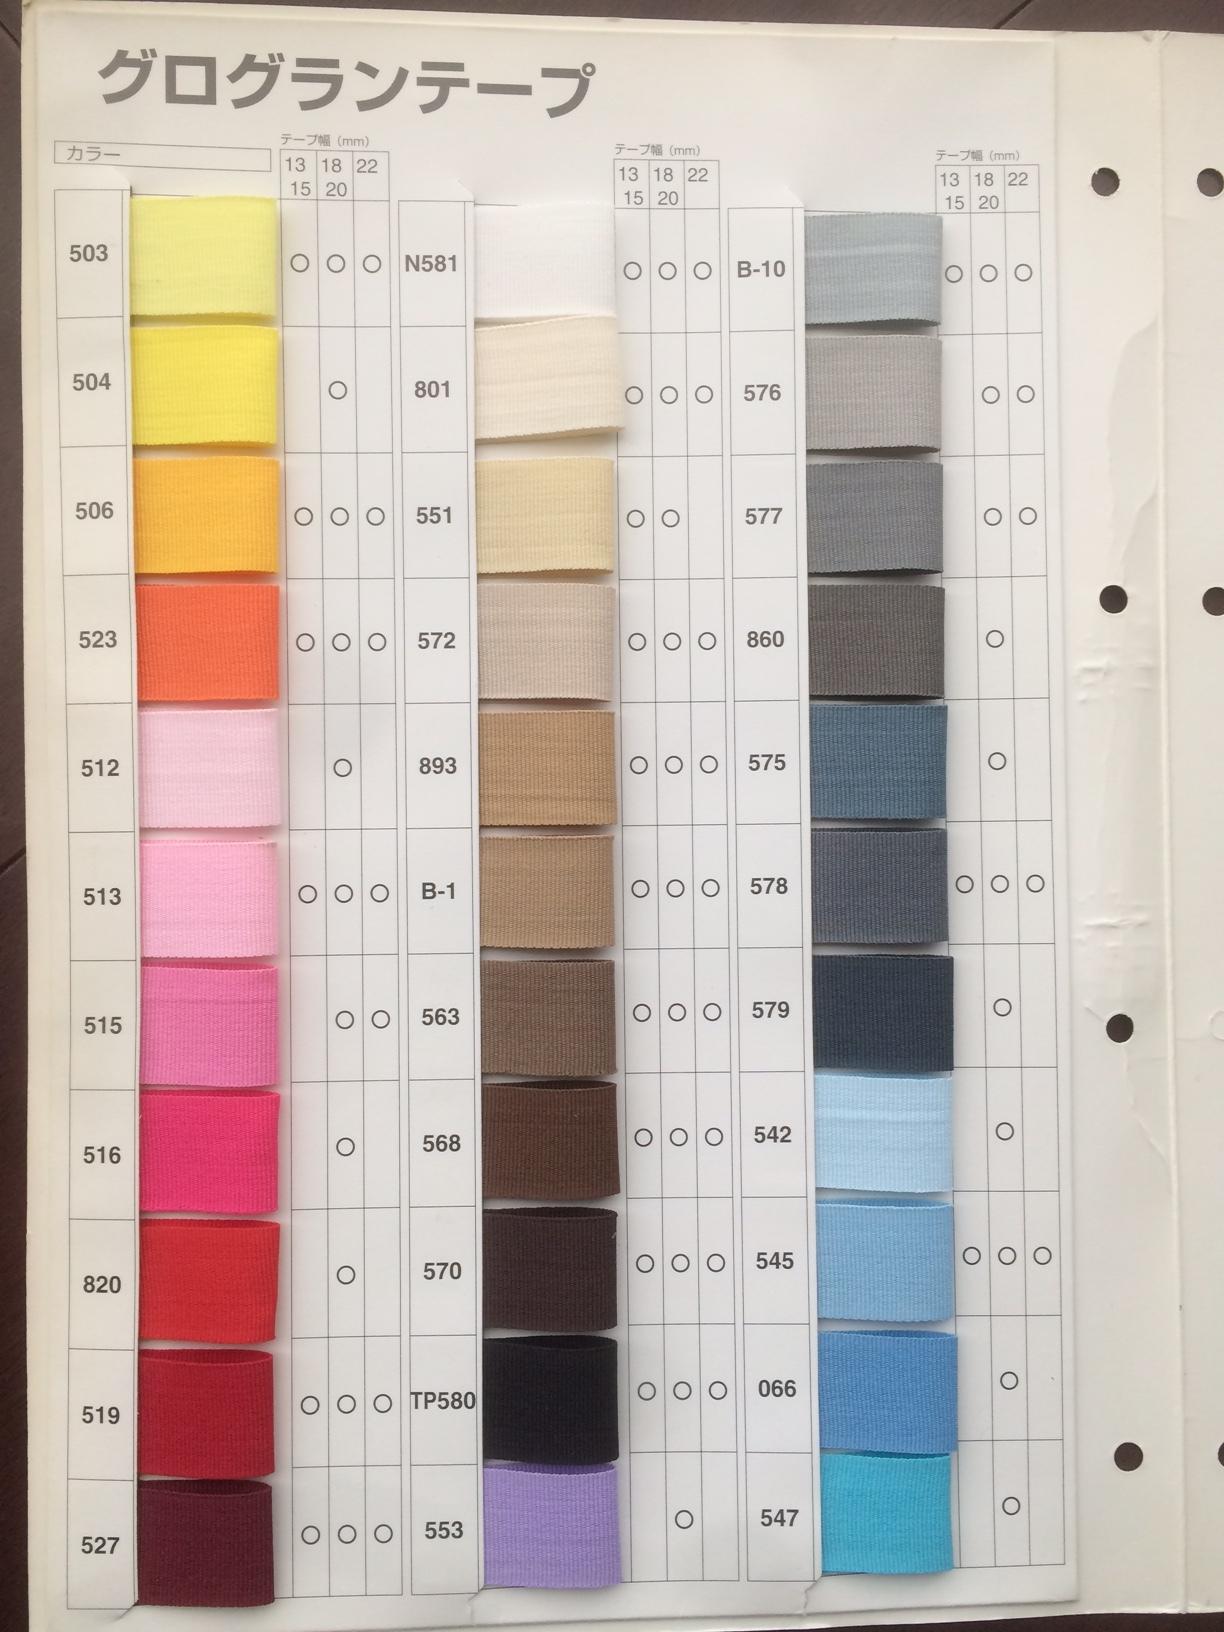 SALE !! 30%オフ YKK グログランテープ 22㎜幅 カラー全色 200m巻